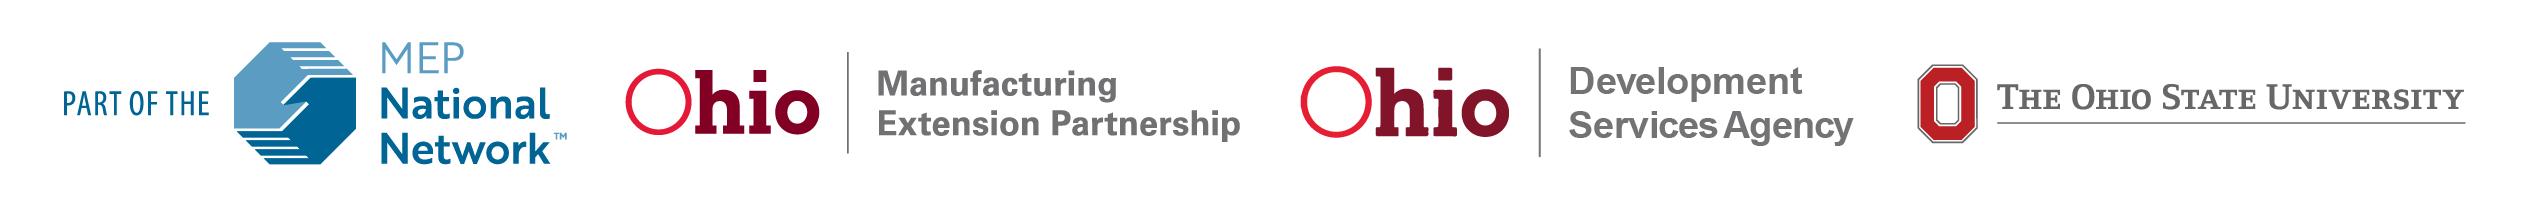 MEP national network ohio manufacturing extension partnership development services state university logos